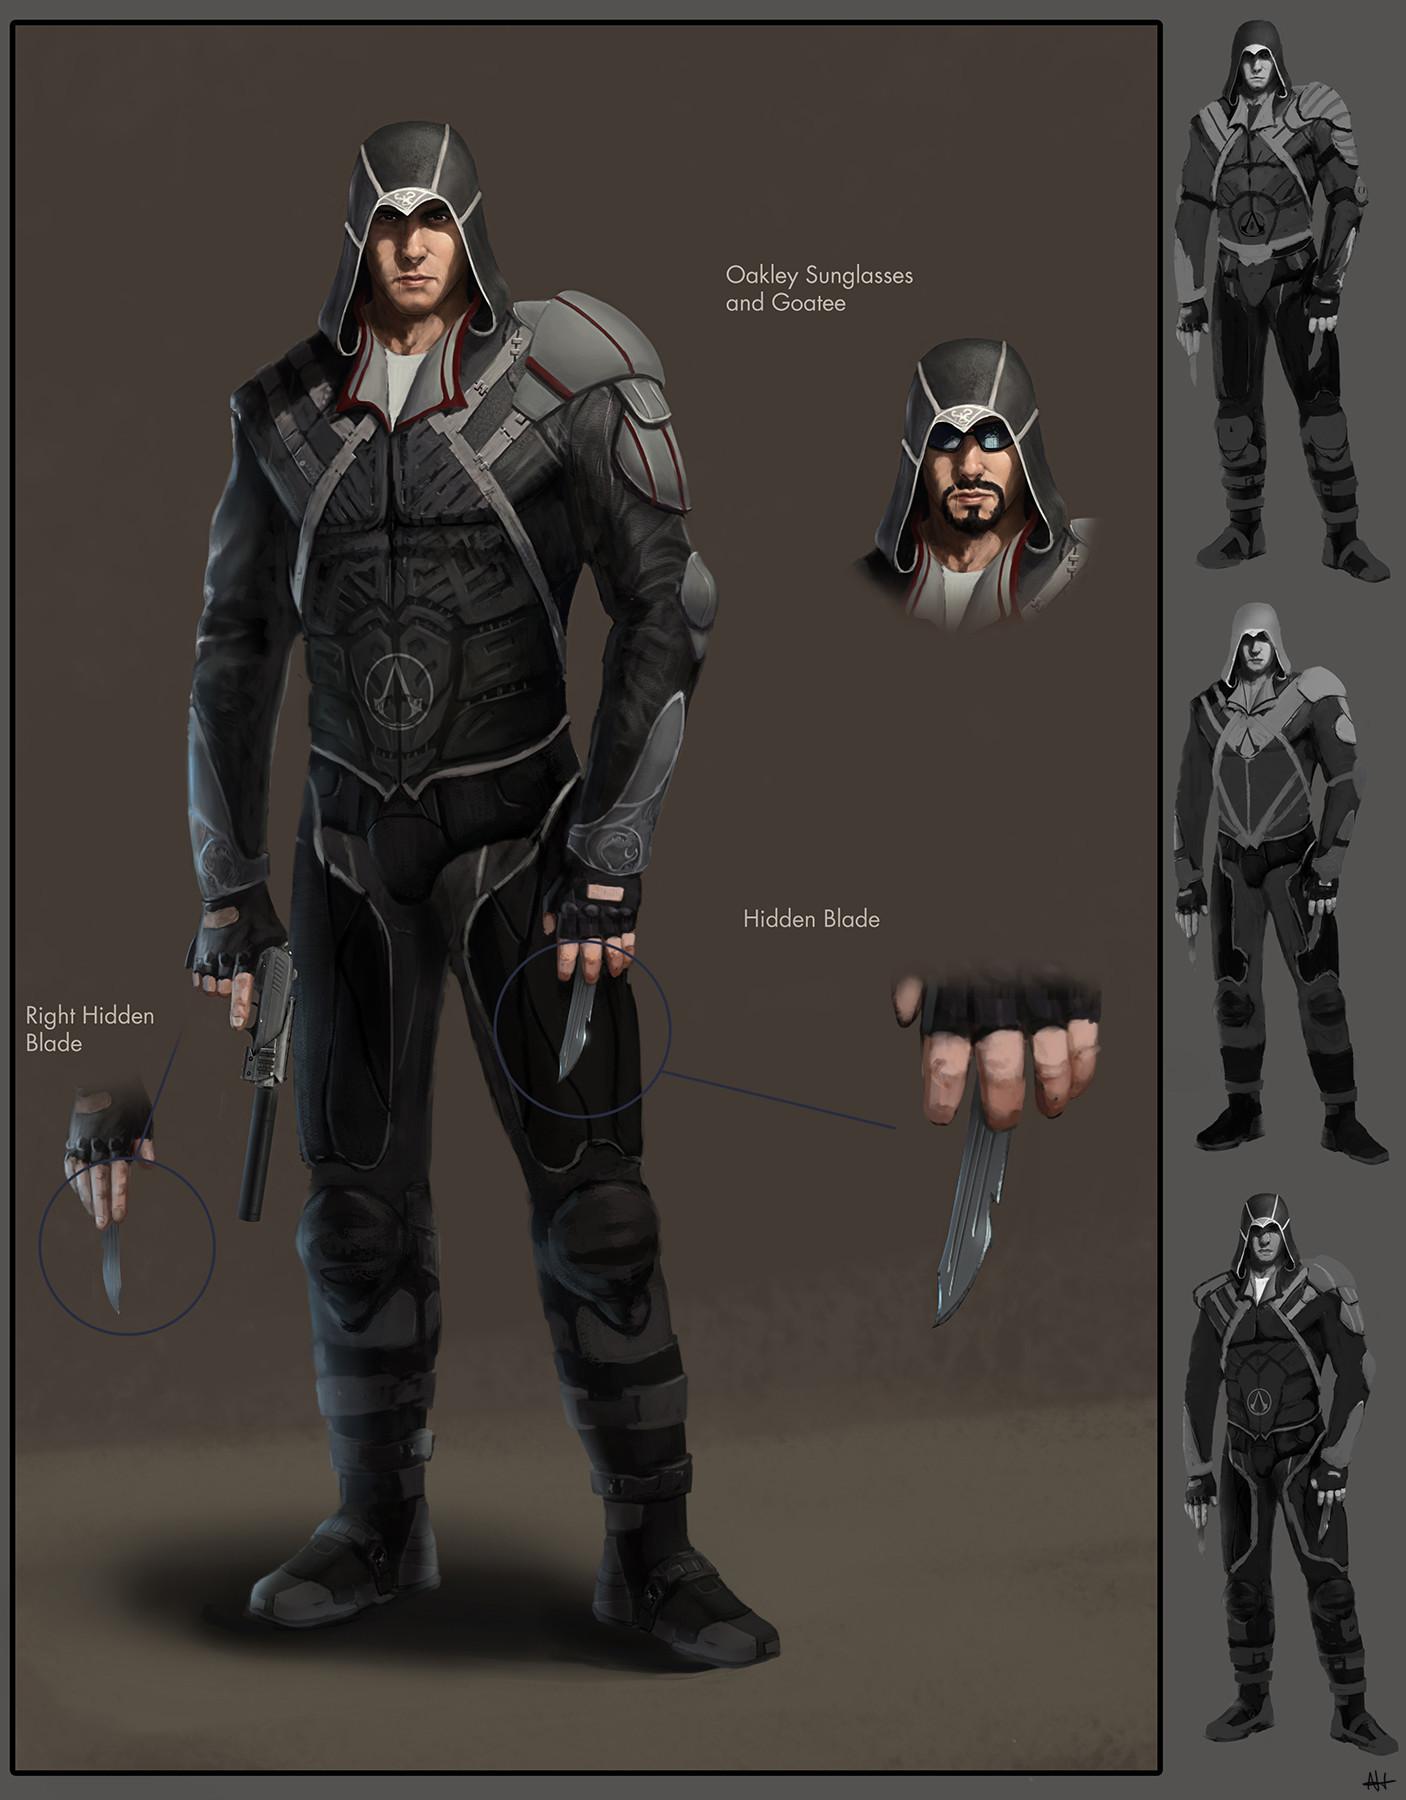 Desmond Miles (Modern Assassin)